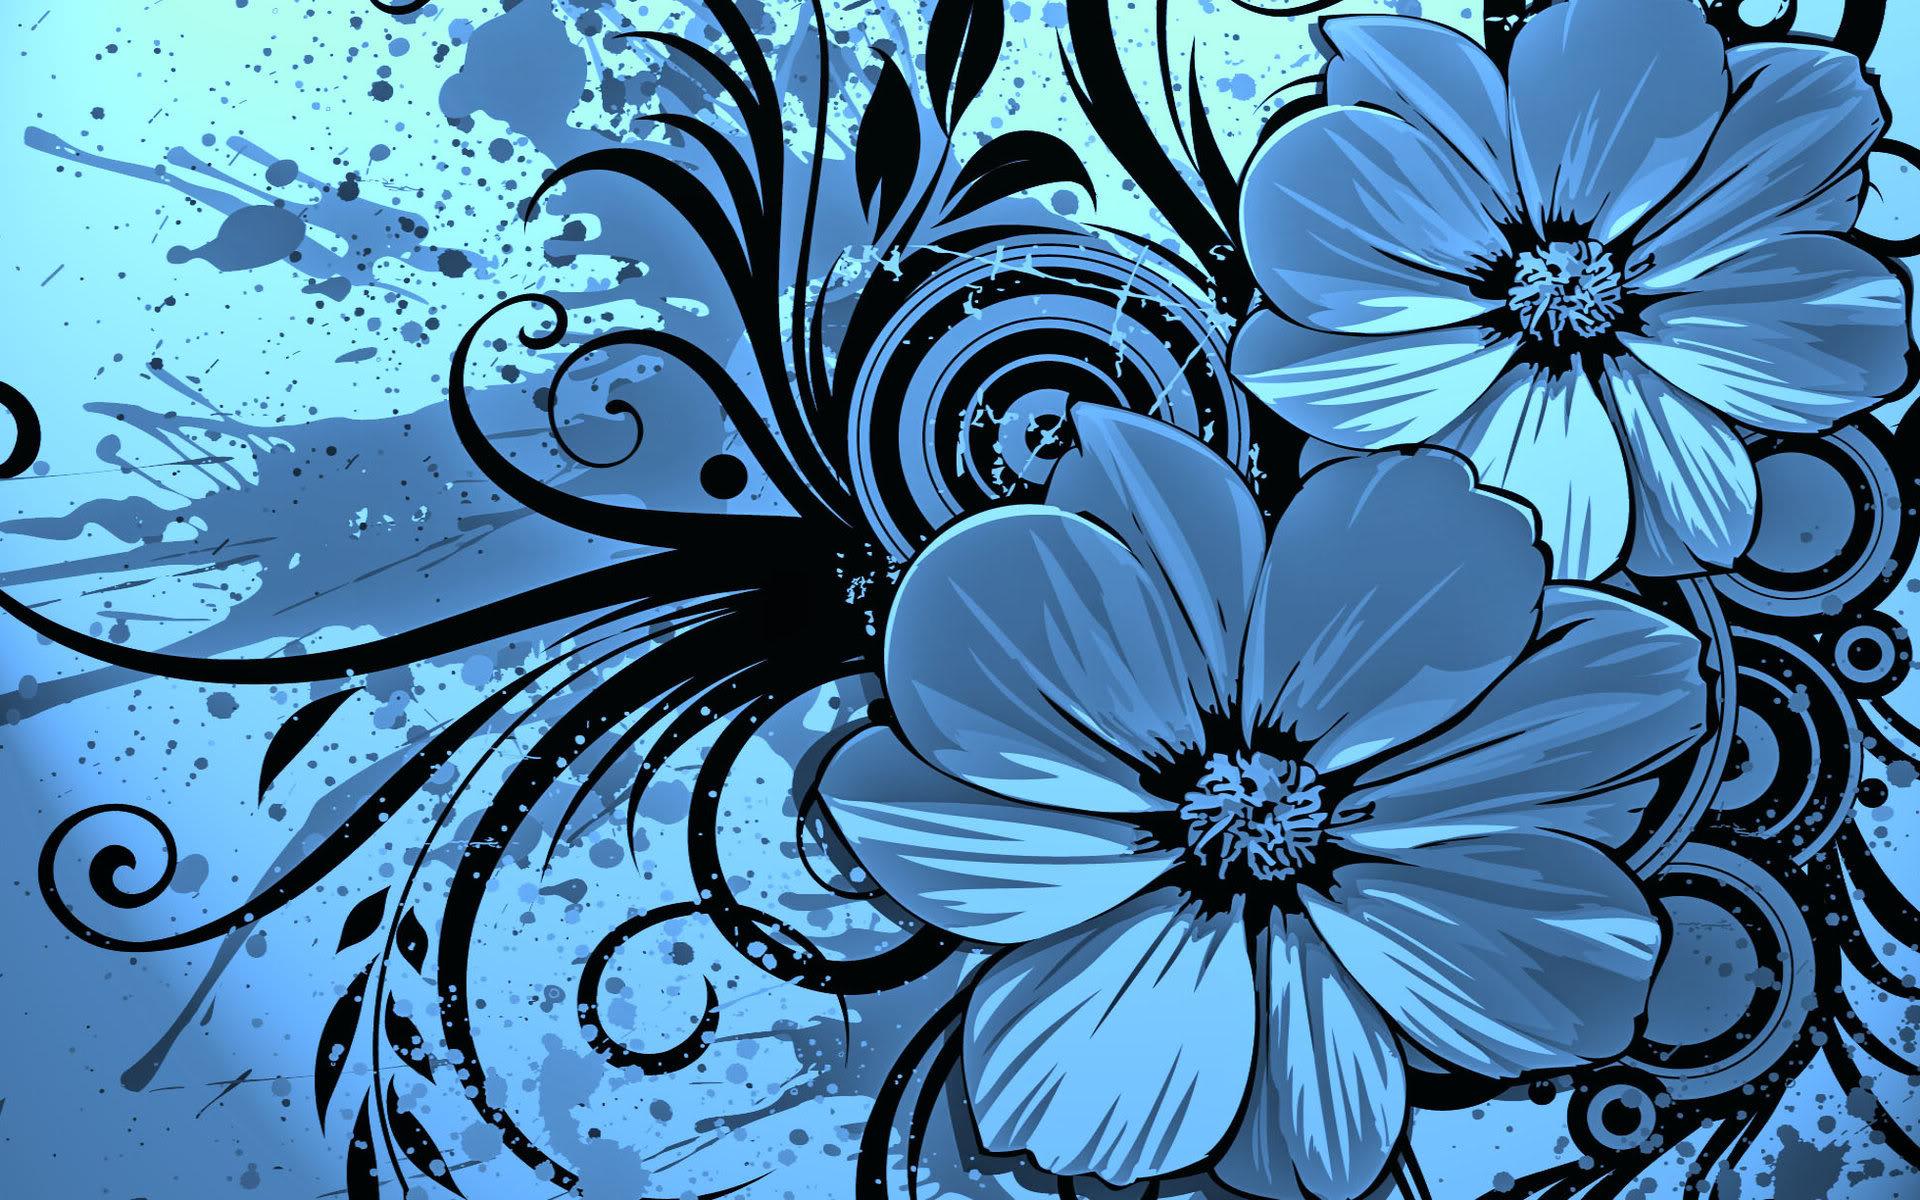 Wallpapers Designs wallpaper Blue Wallpapers Designs hd wallpaper 1920x1200